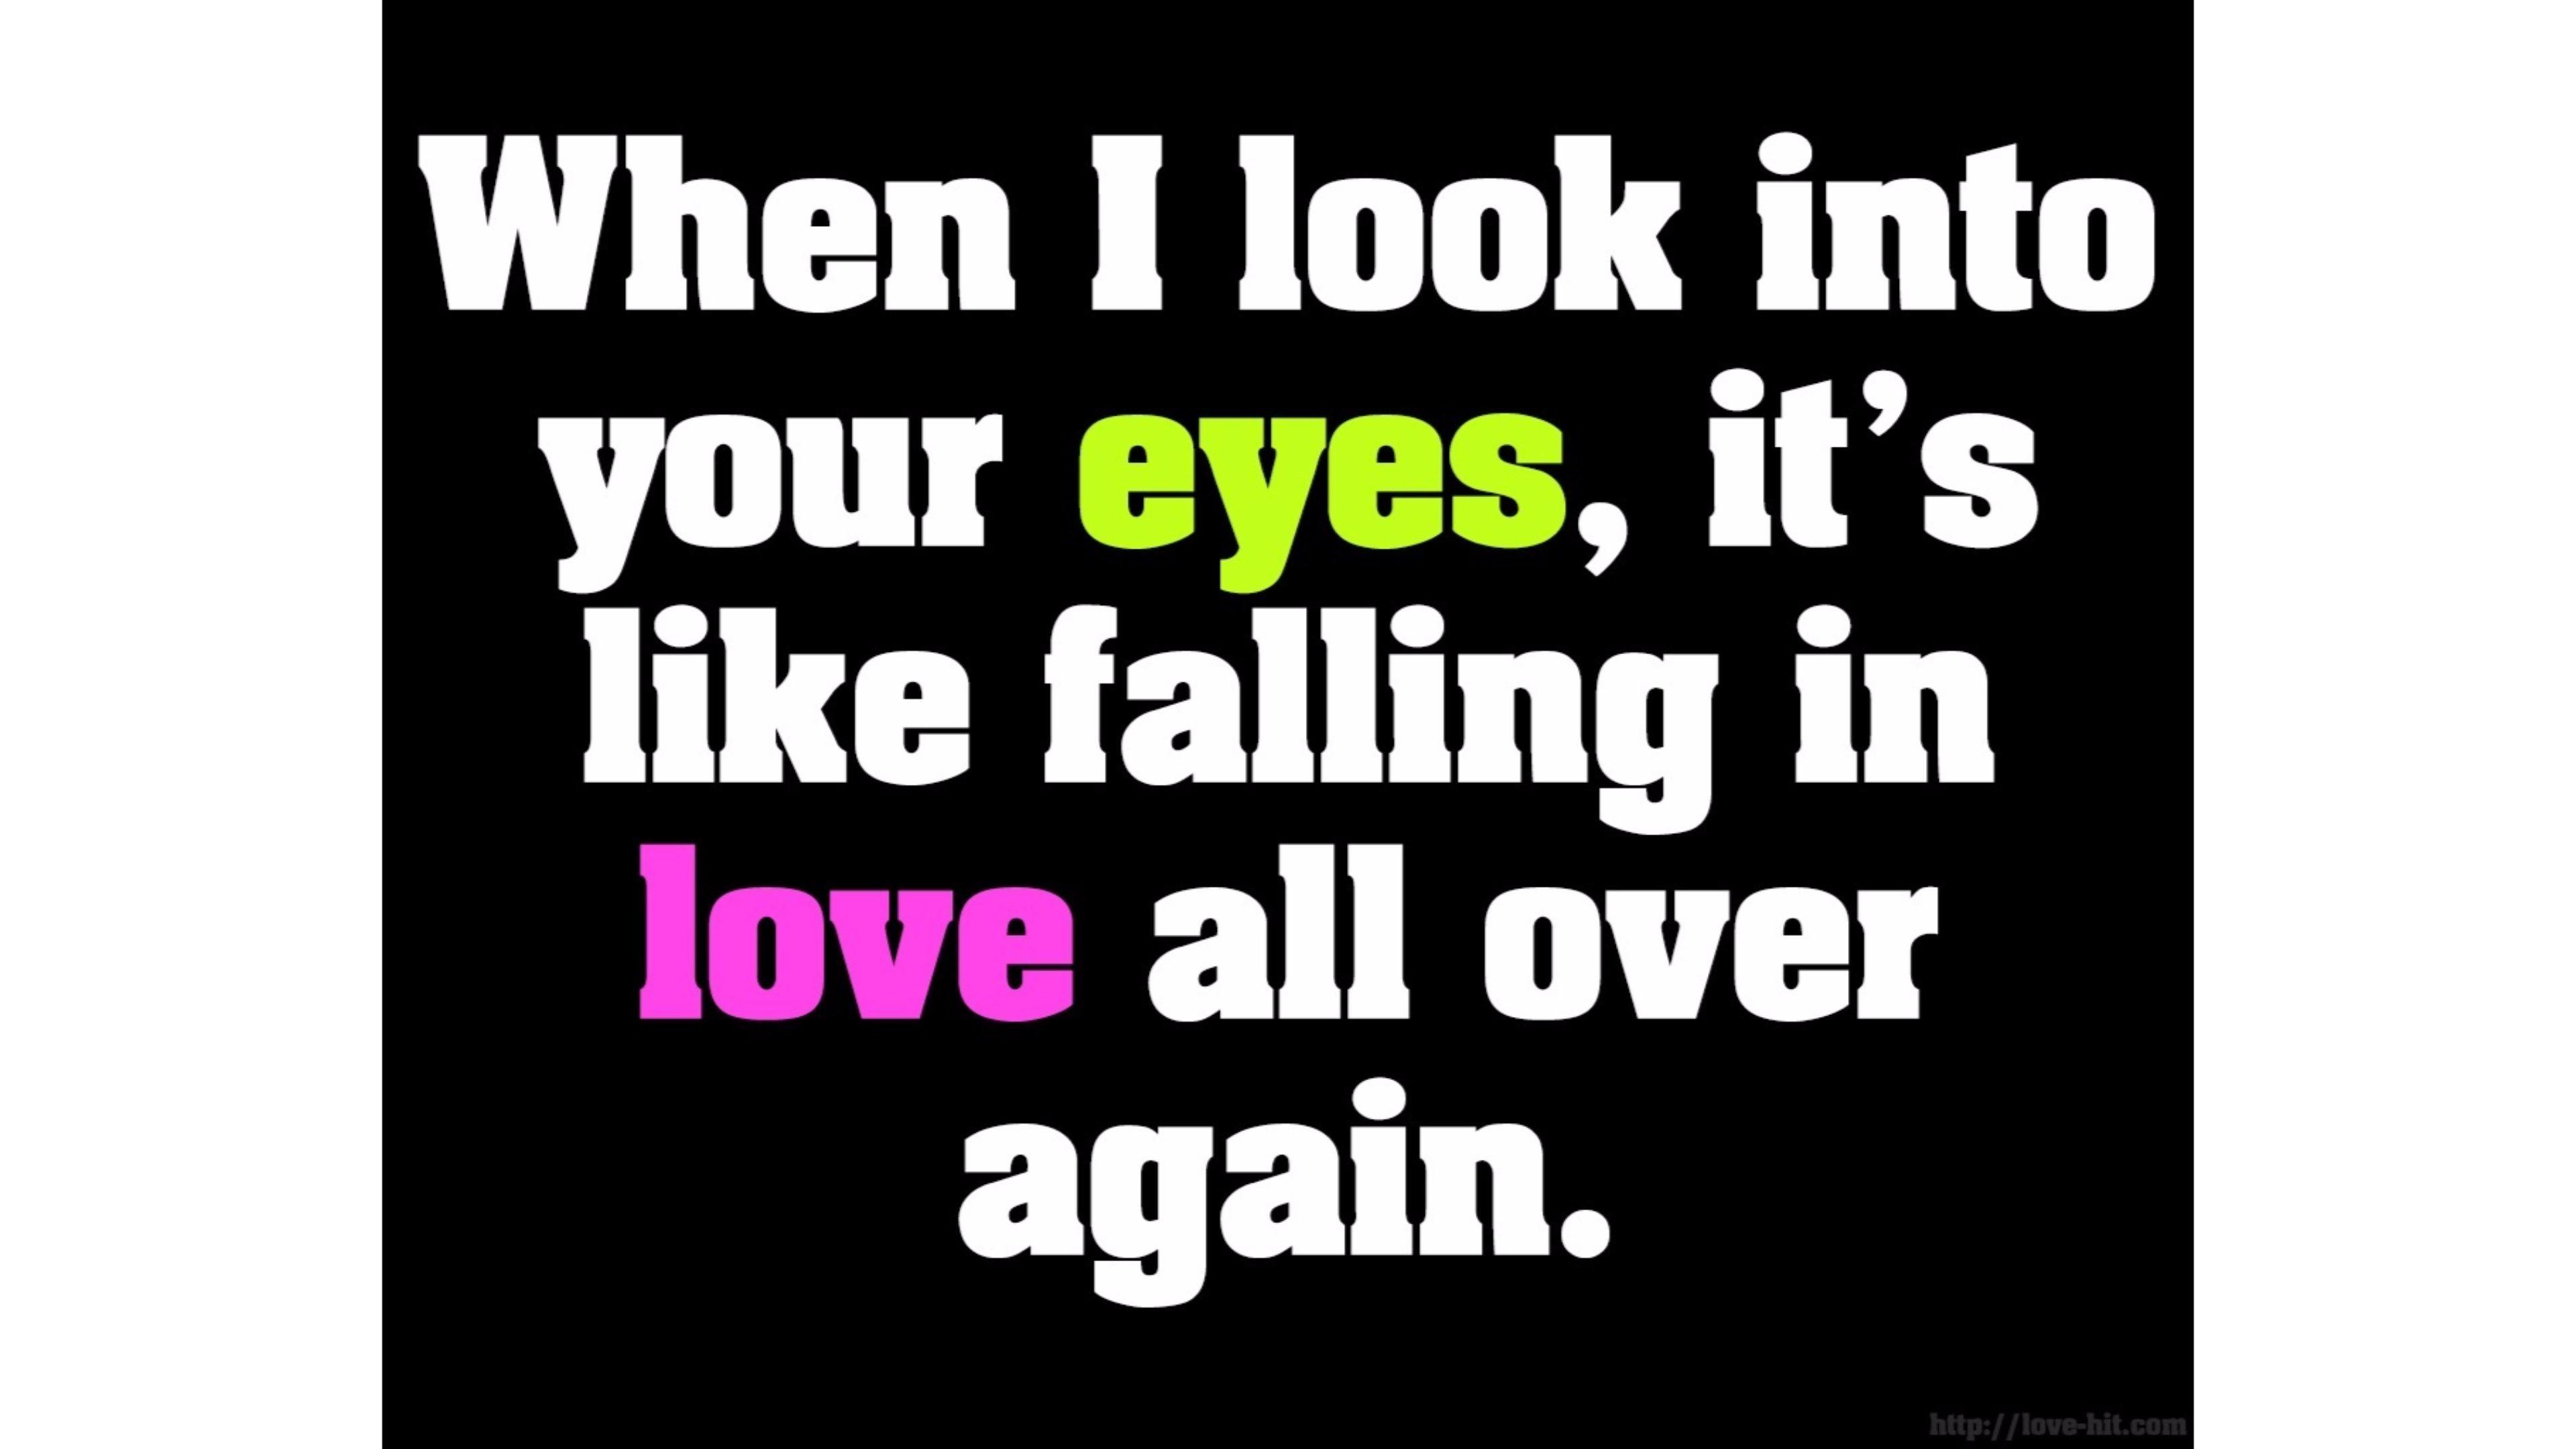 Cute Love Quote For Her 4k Wallpaper   Data Src Widescreen - Poster - HD Wallpaper